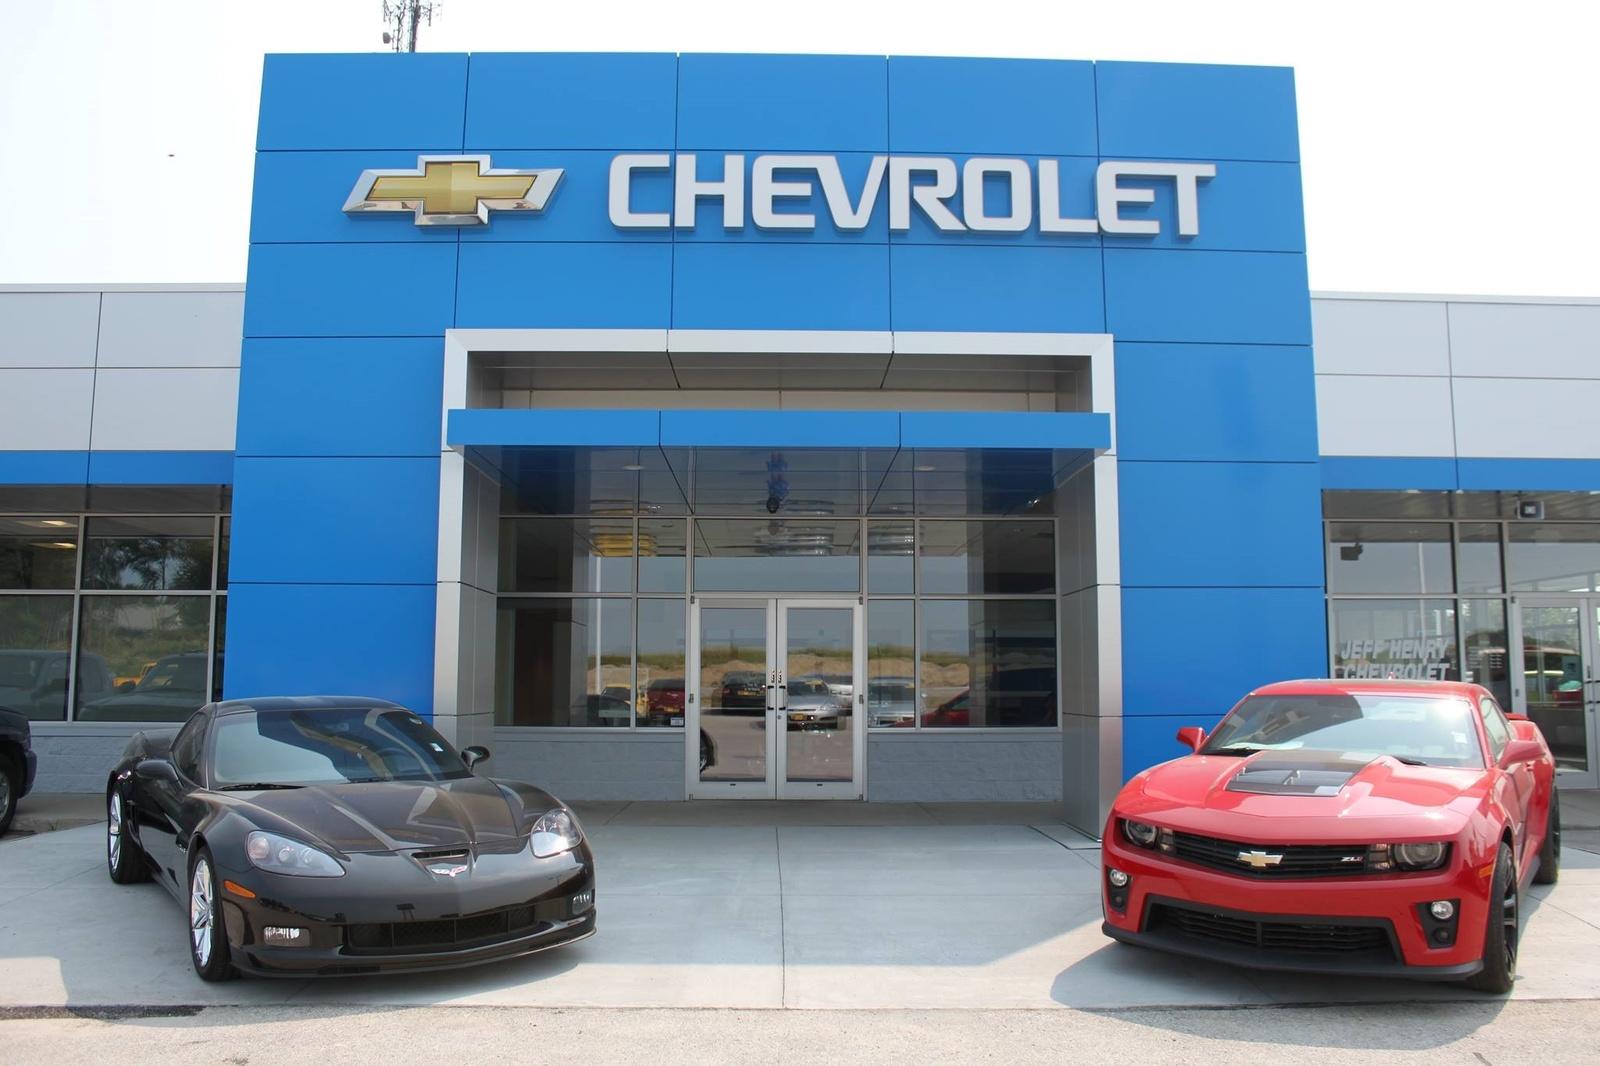 Plattsmouth Jeff Henry Chevrolet Autos Post